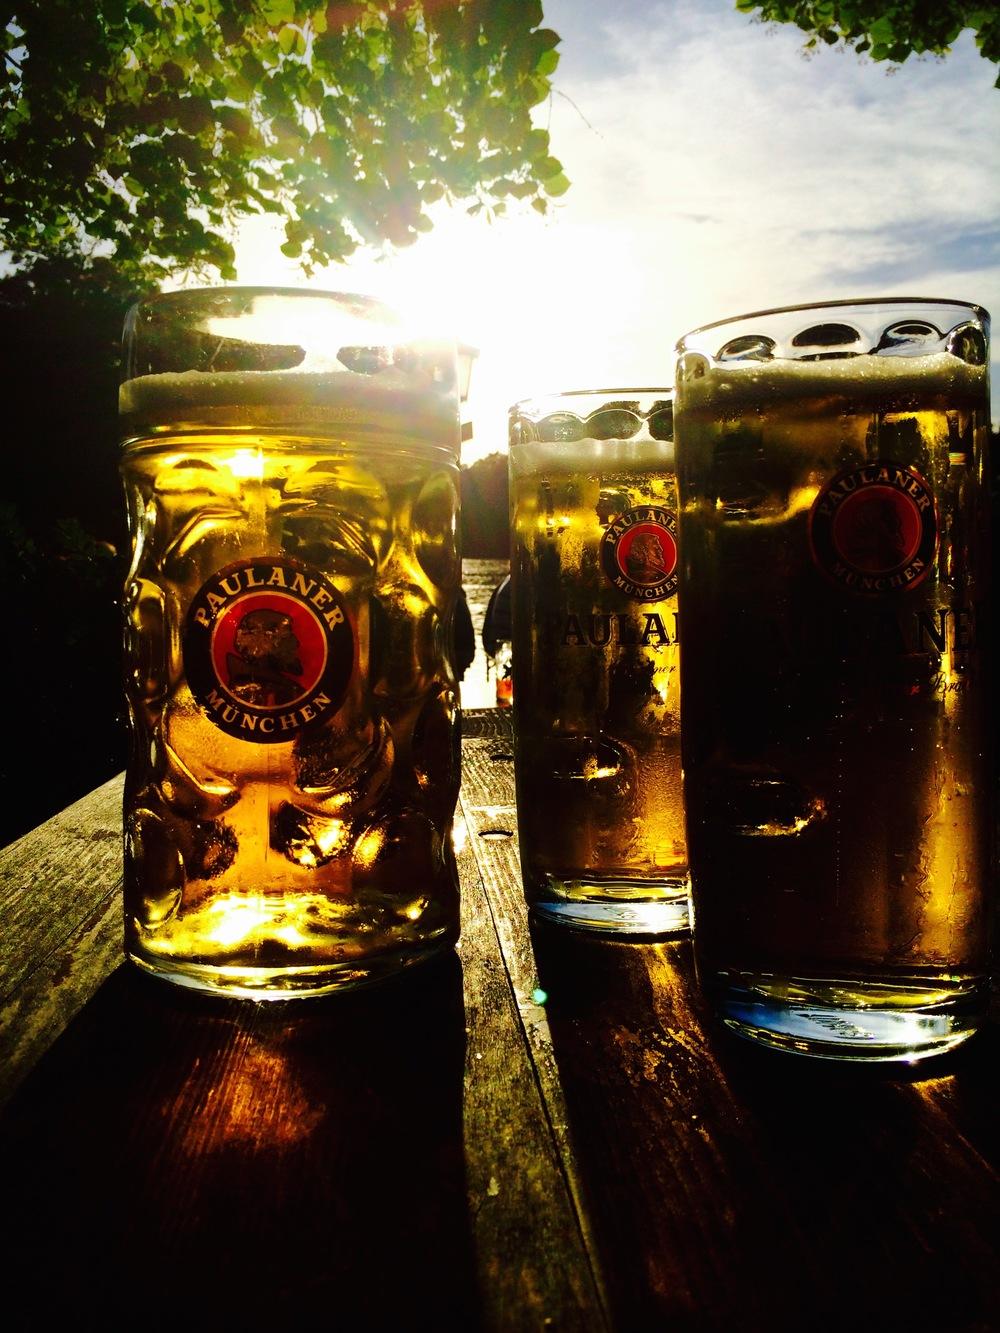 Paulaner beer, Seehaus Munich Germany - 3 Days*